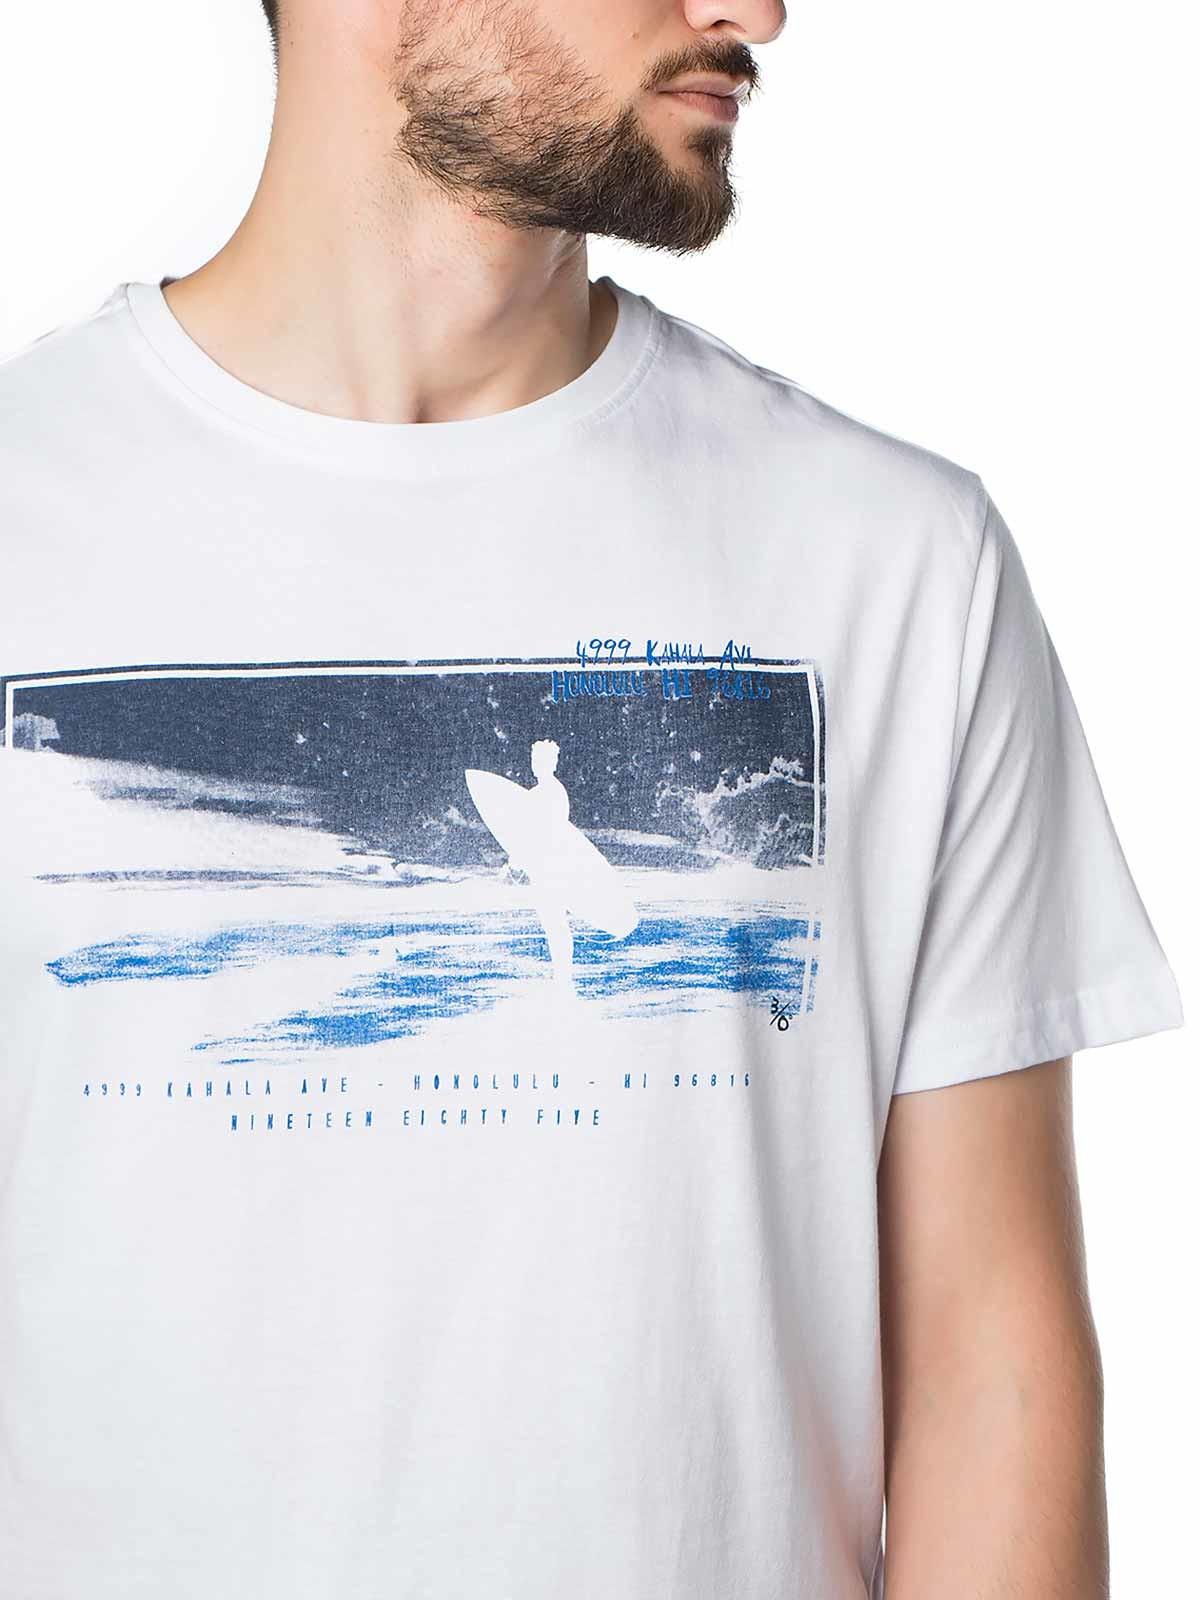 T-shirt manga curta estampada surfista